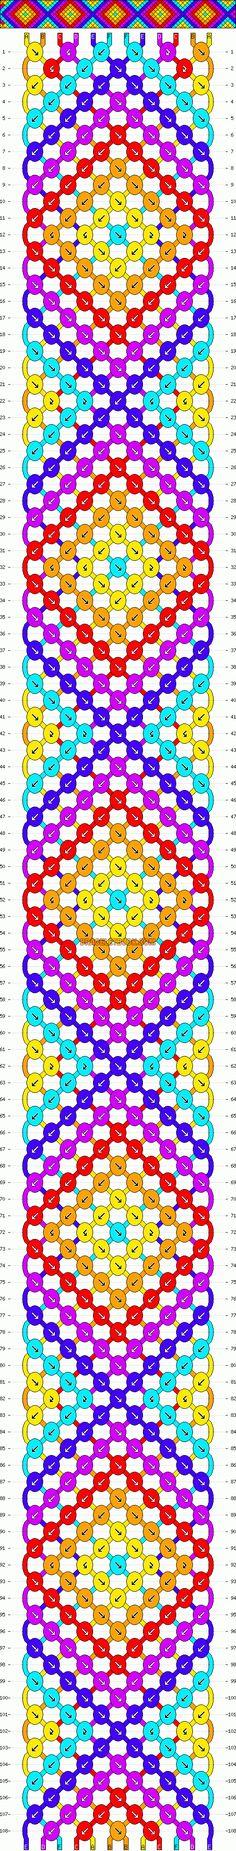 Normal Friendship Bracelet Pattern #11940 - BraceletBook.com